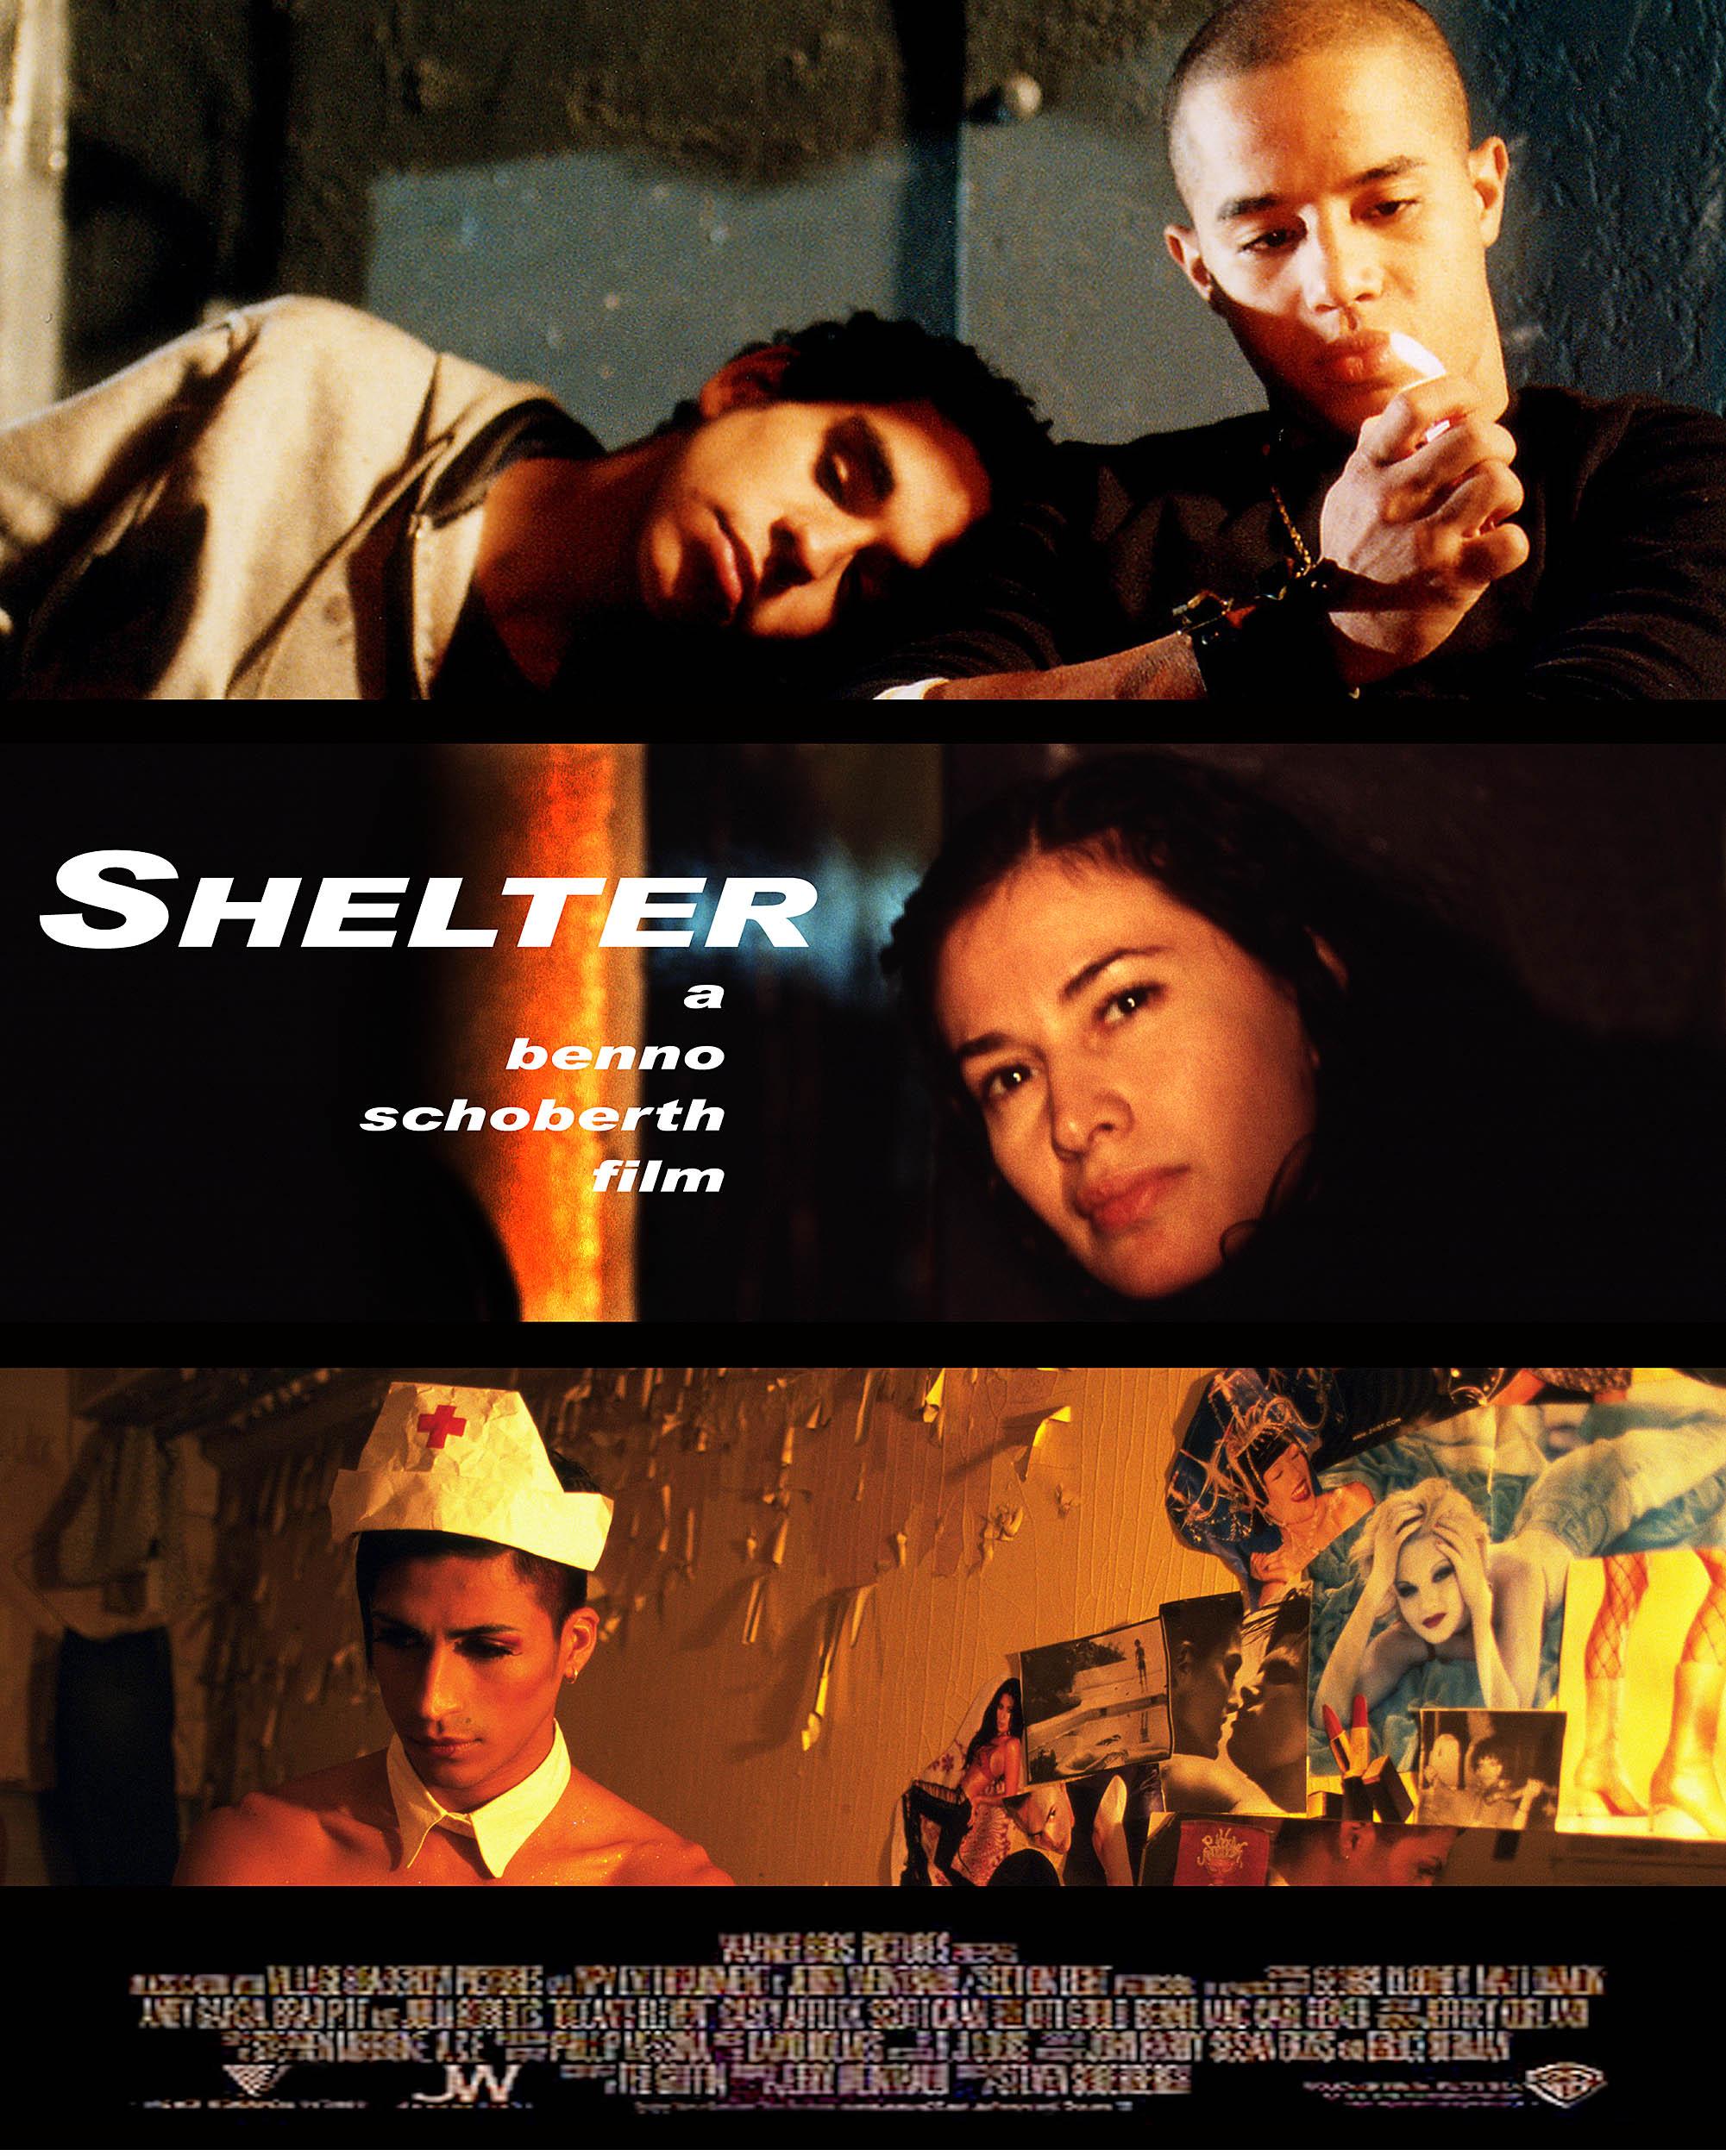 shelterposter01.jpg